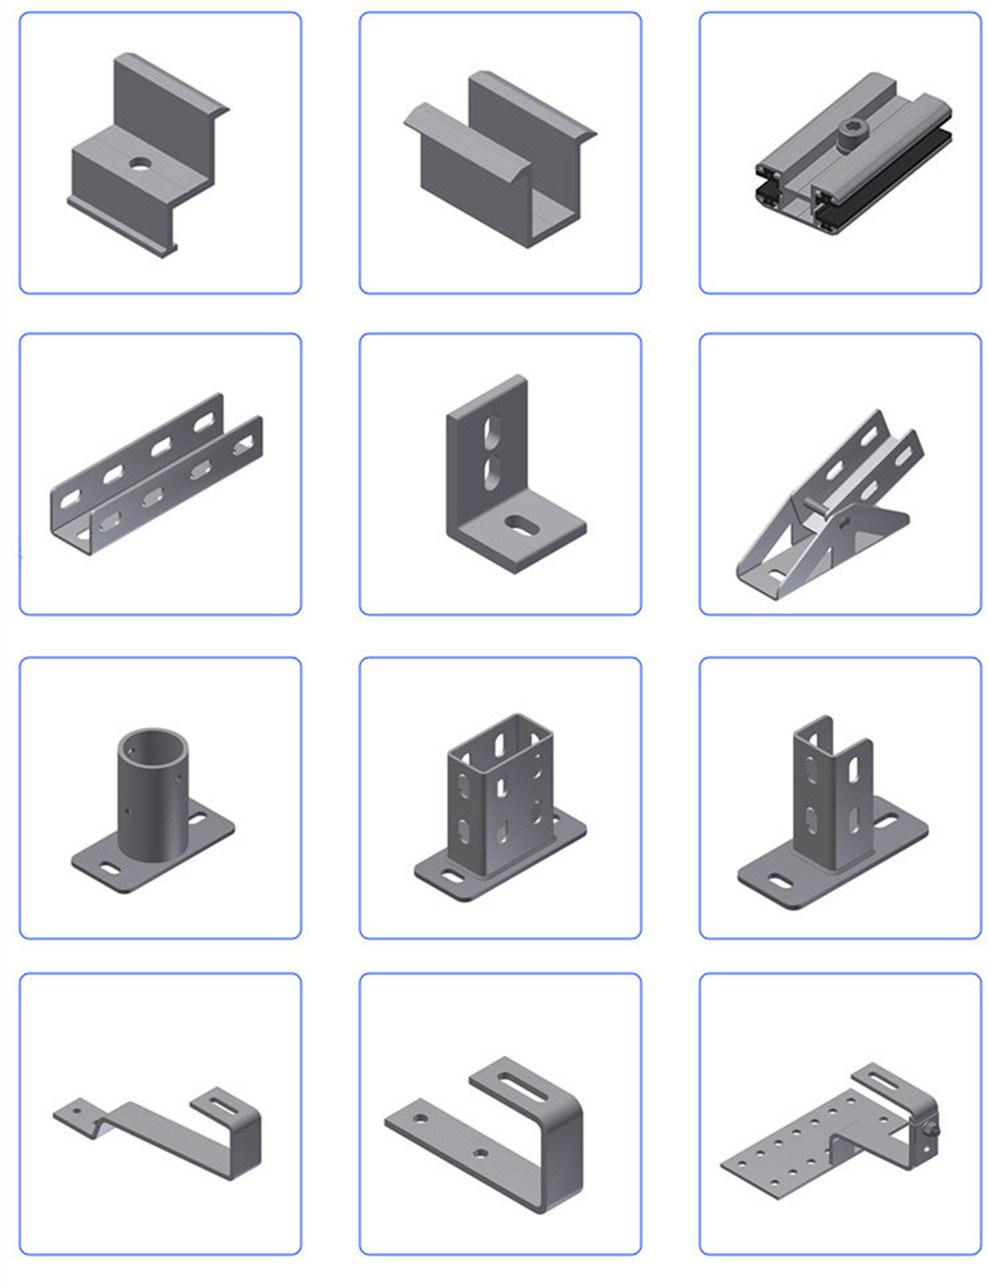 Galvanized Steel Drywall Furring Channel